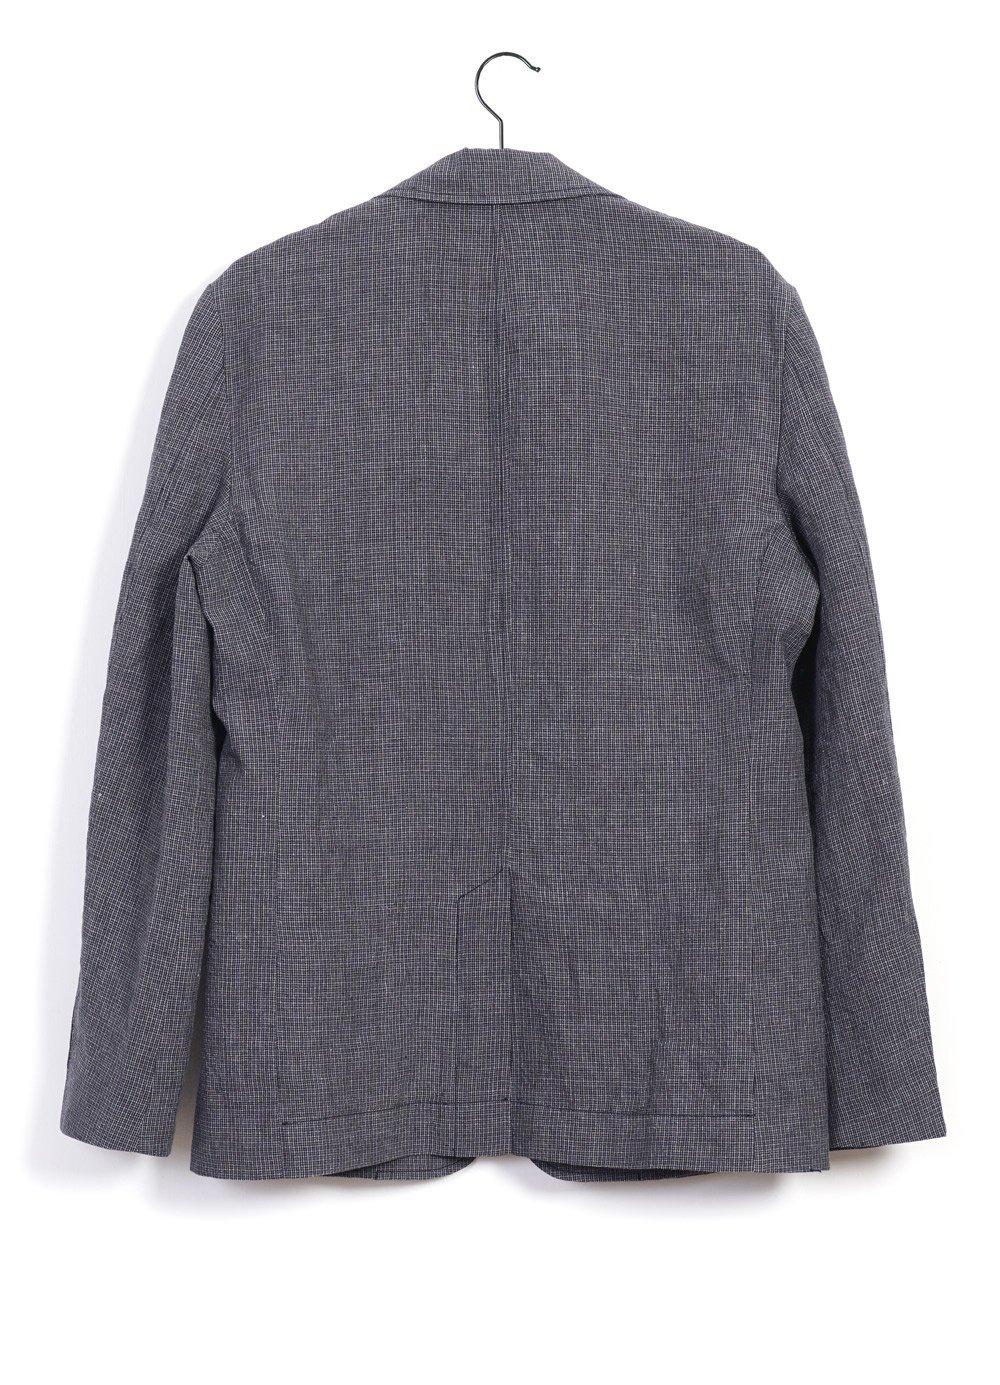 Hansen Garments CHRIS | Two Button Classic Blazer | River